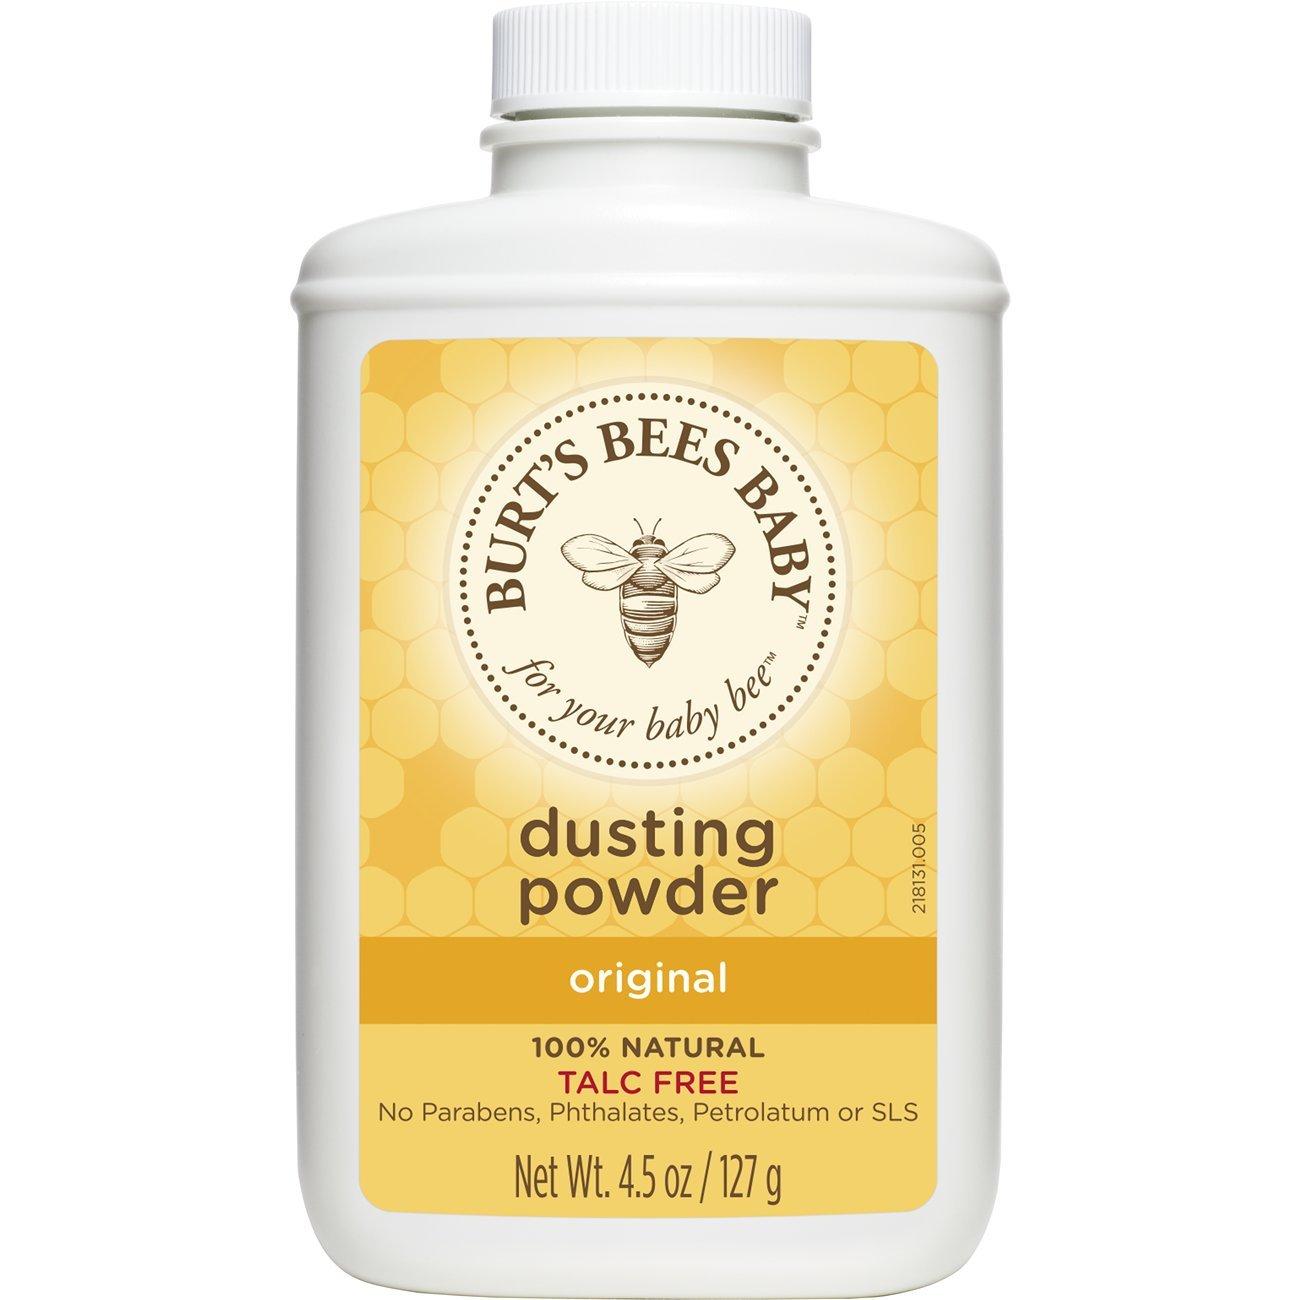 Burt's Bees Baby 100% Natural Dusting Powder, Talc-Free Baby Powder - 4.5 Ounce Bottle by Burt's Bees Baby